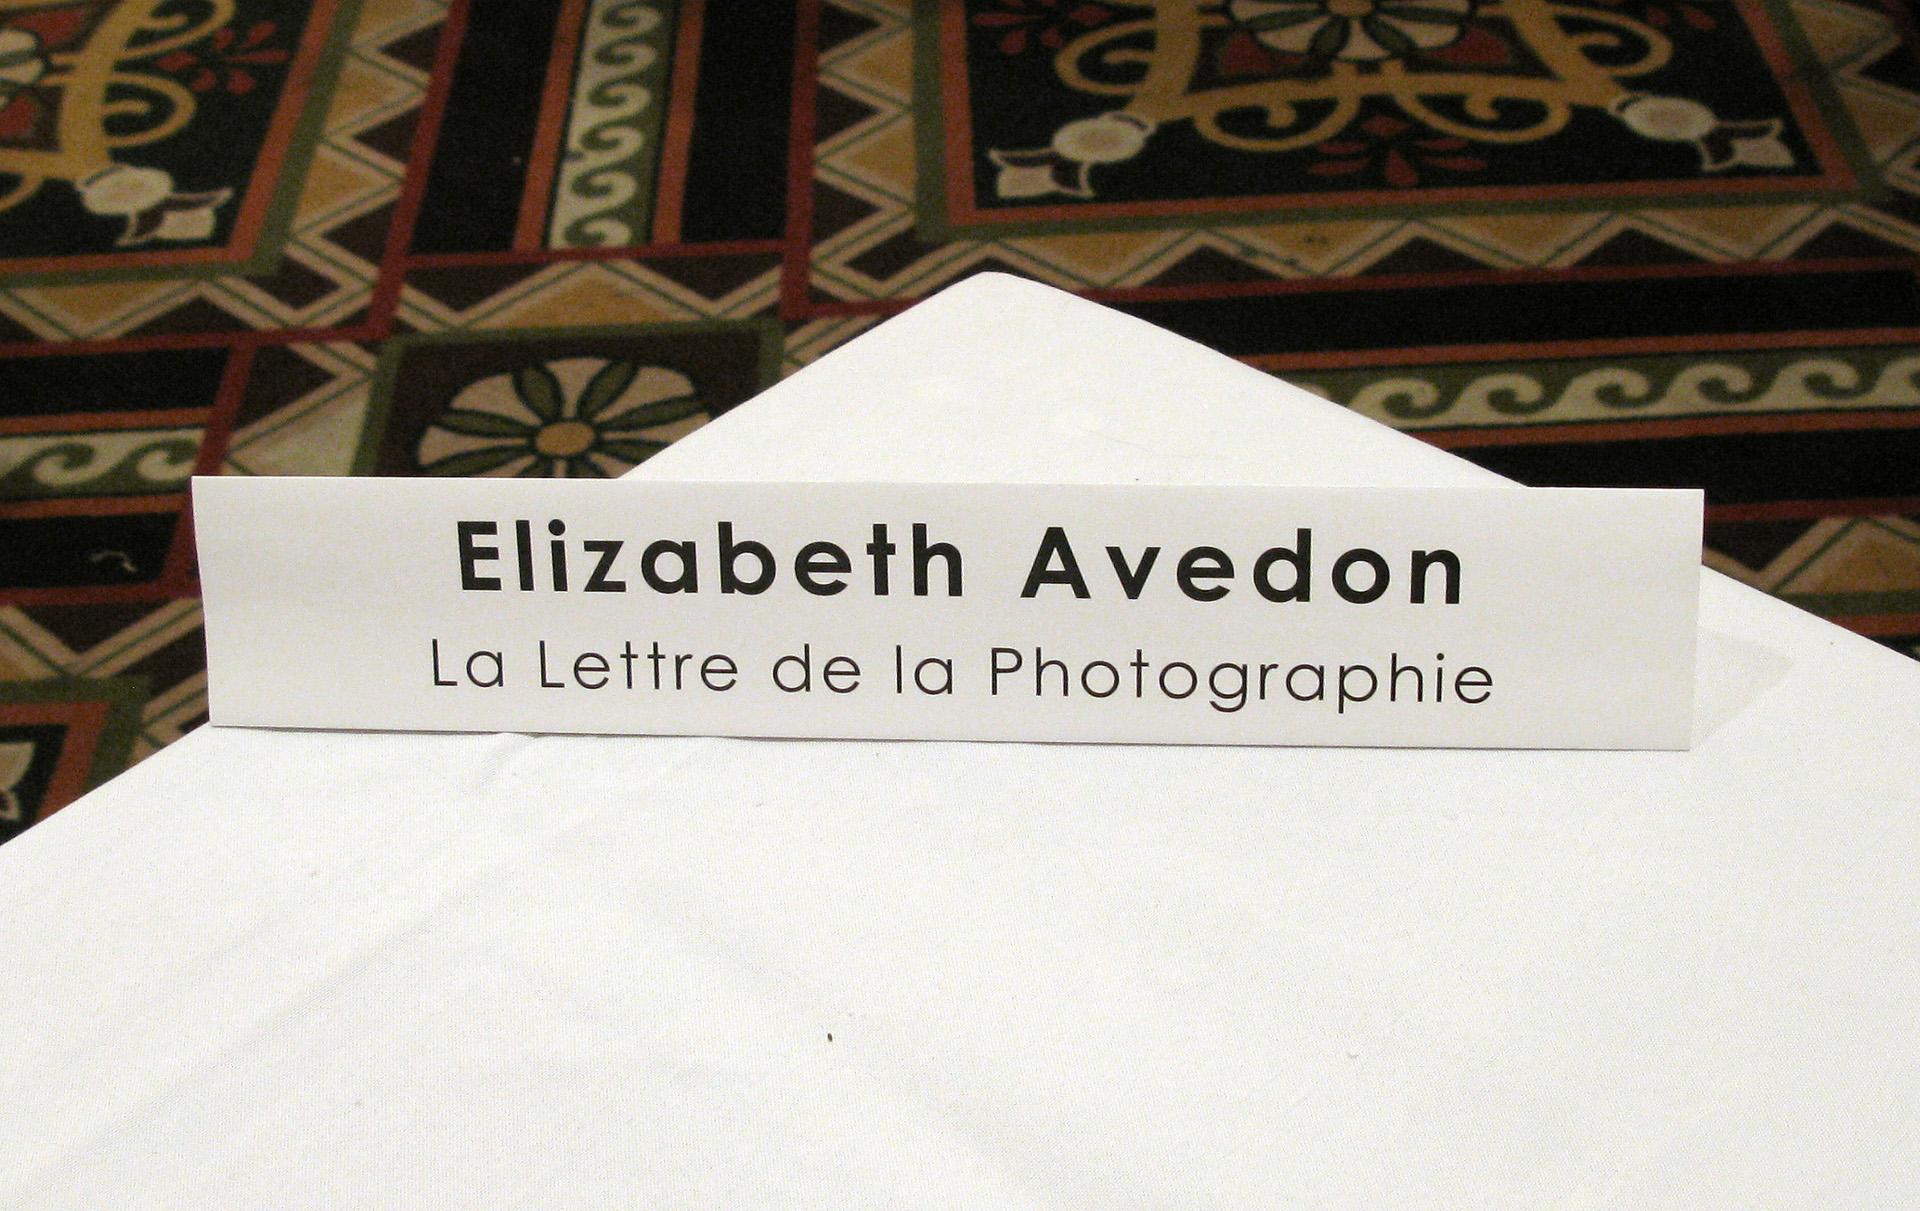 Elizabeth Avedon -in Santa Fe, Part 2 - The Eye of